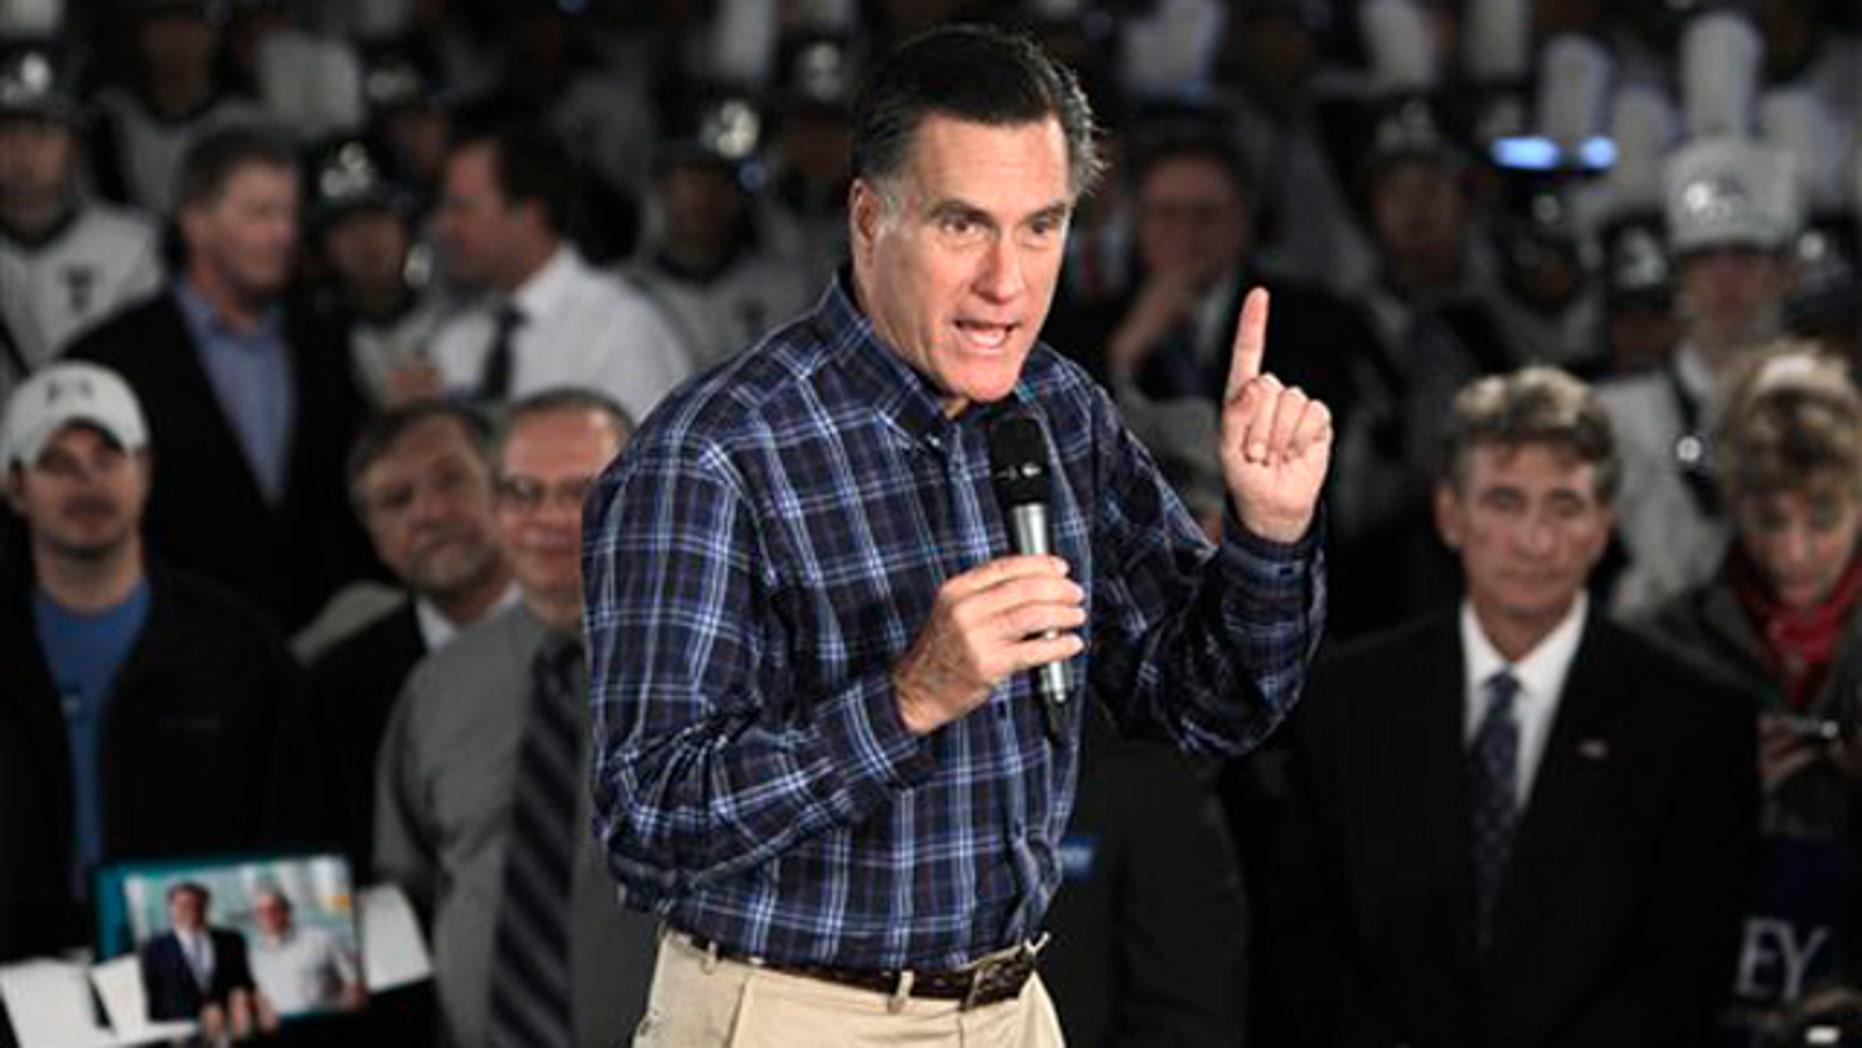 Nov. 10, 2011: Former Massachusetts Gov. Mitt Romney speaks at the American Polish Cultural Center in Troy, Mich.